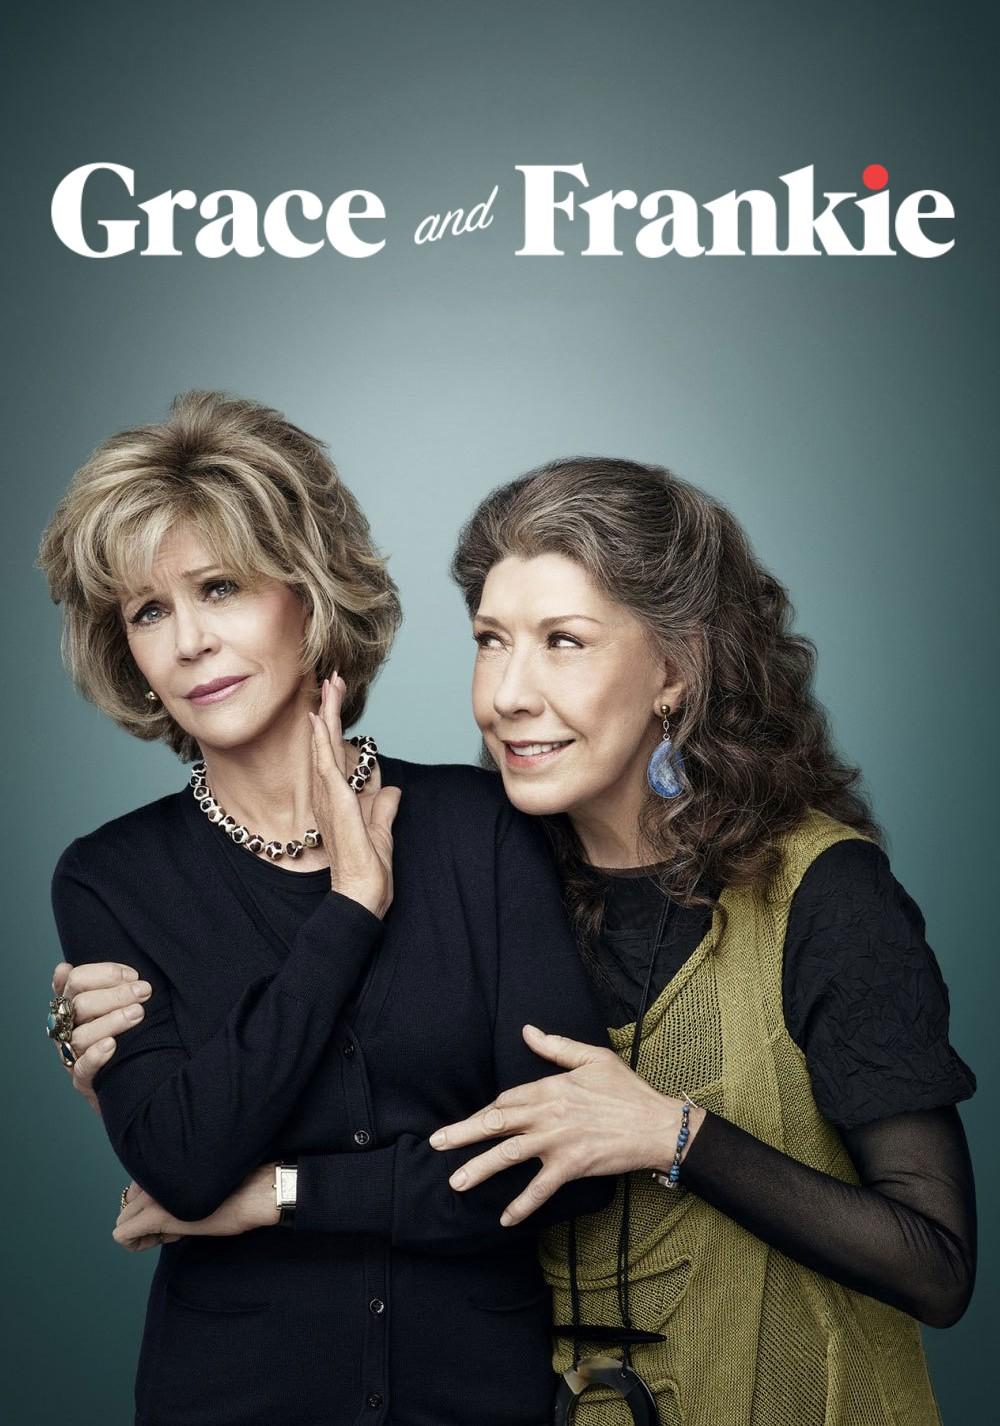 Grace Frankie